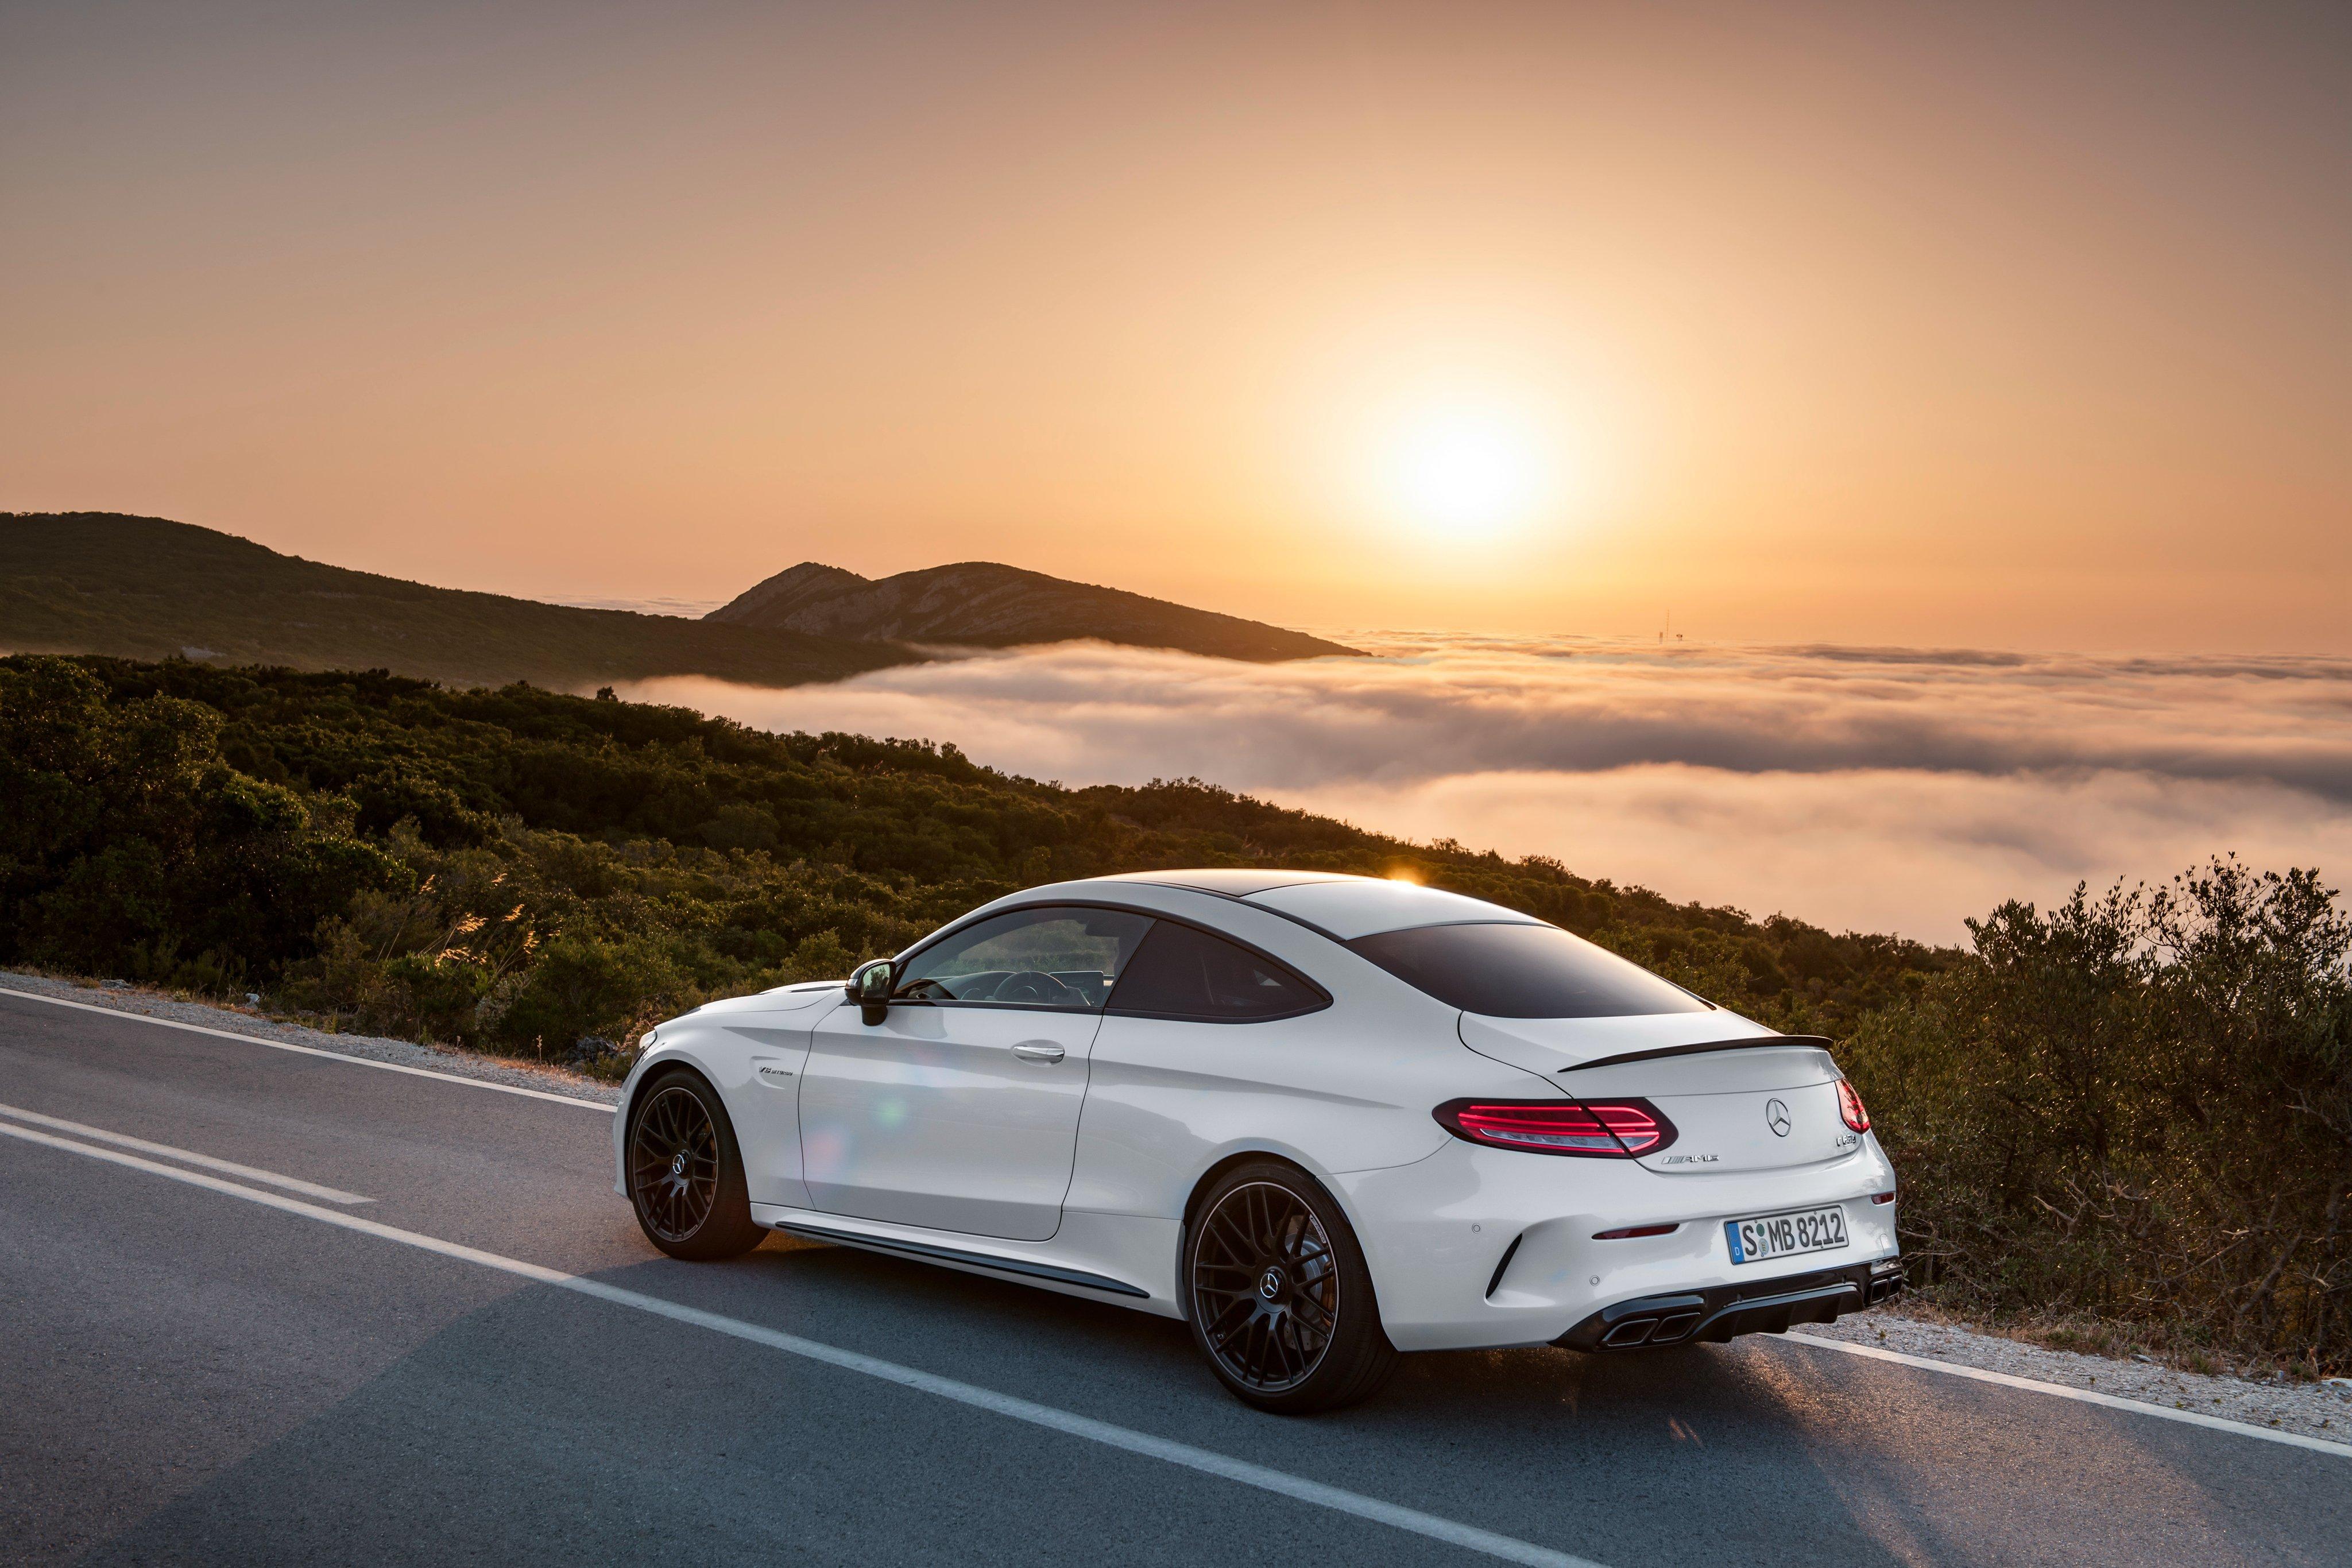 2015 Mercedes AMG C63 S Coupe C205 benz luxury wallpaper 4096x2731